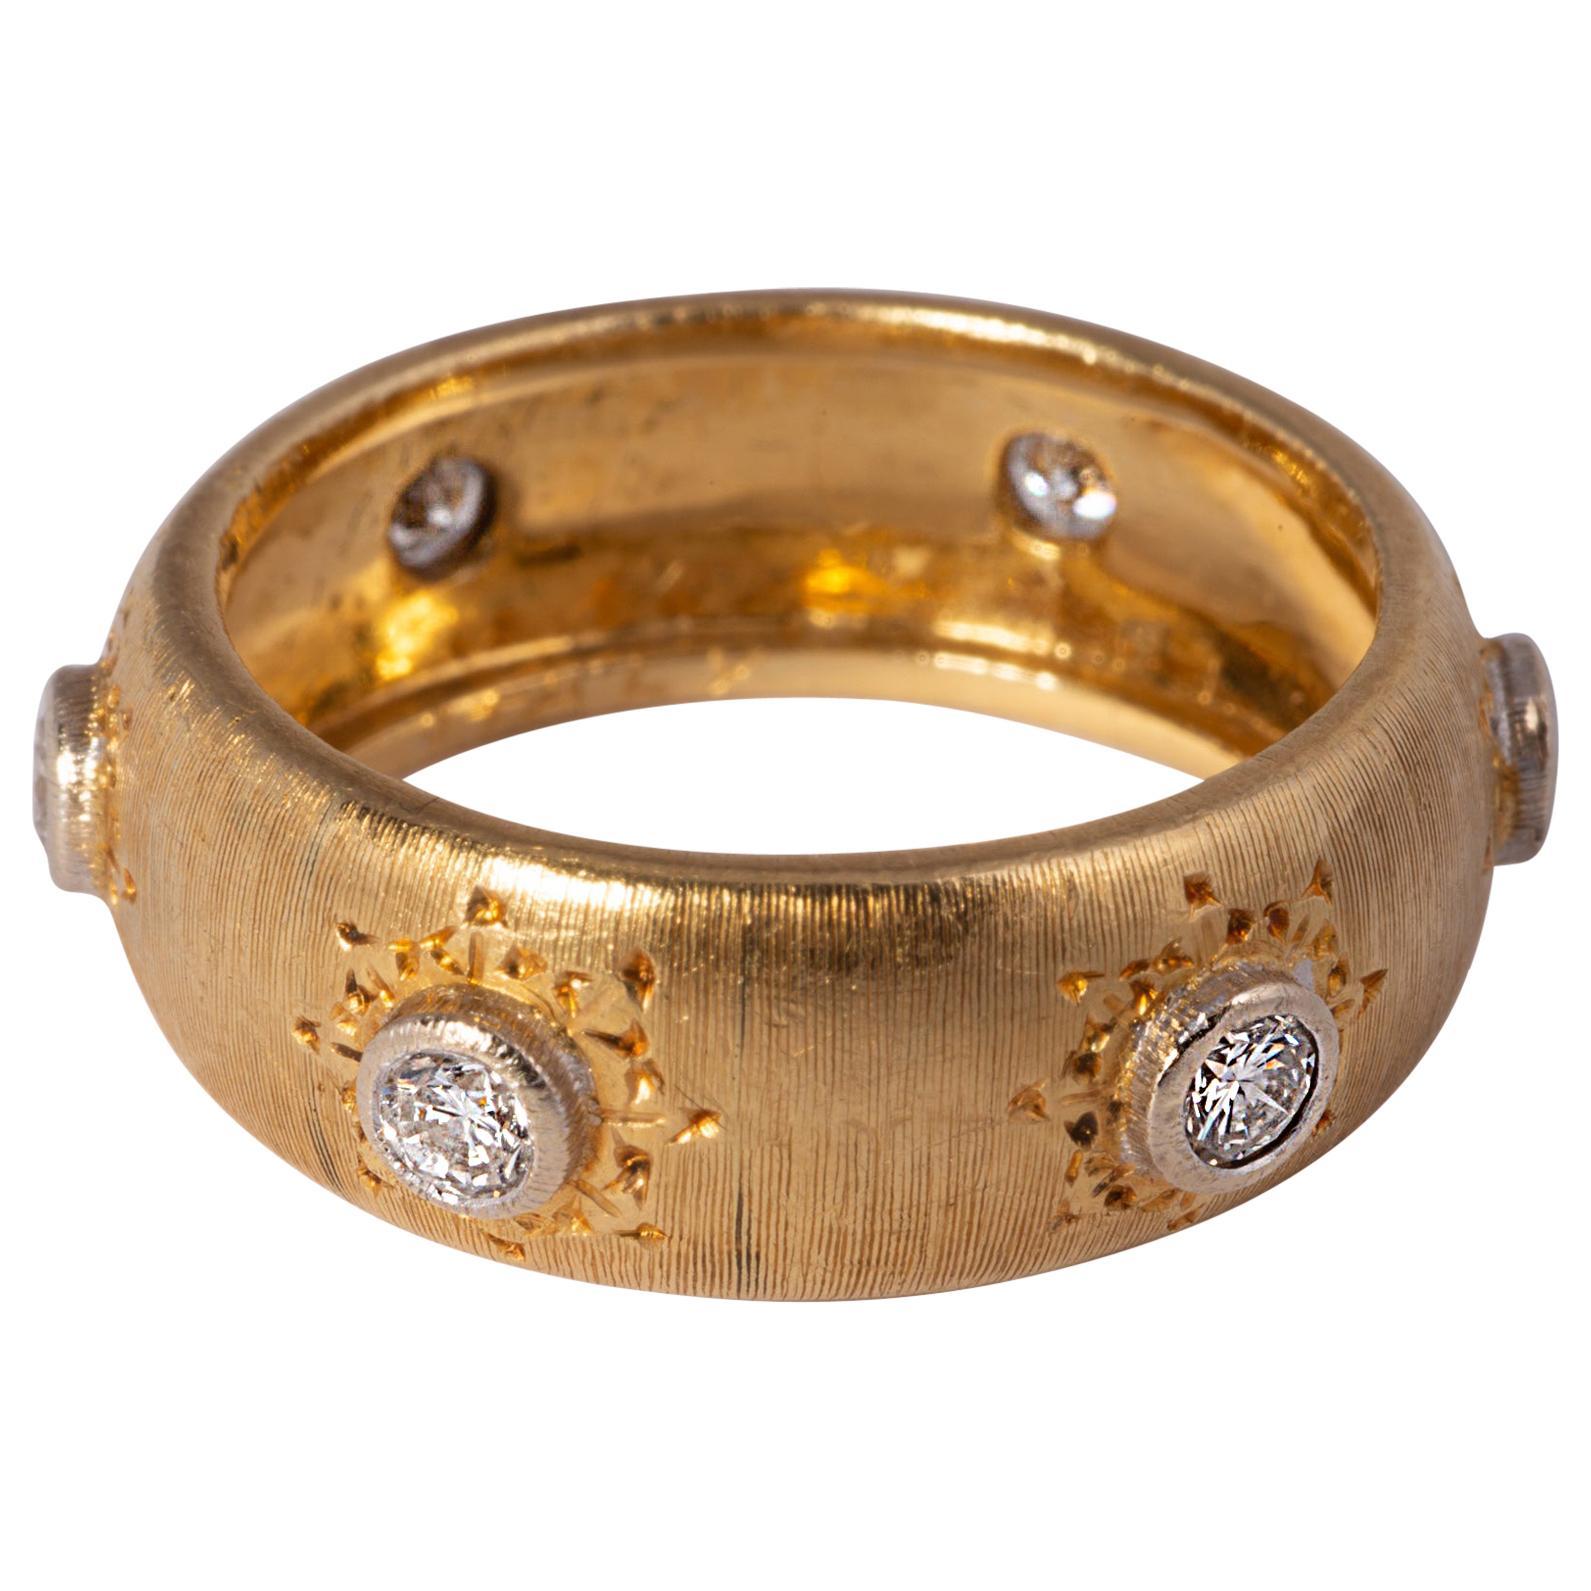 Mario Buccellati Band with Diamonds 18 Karat Yellow Gold